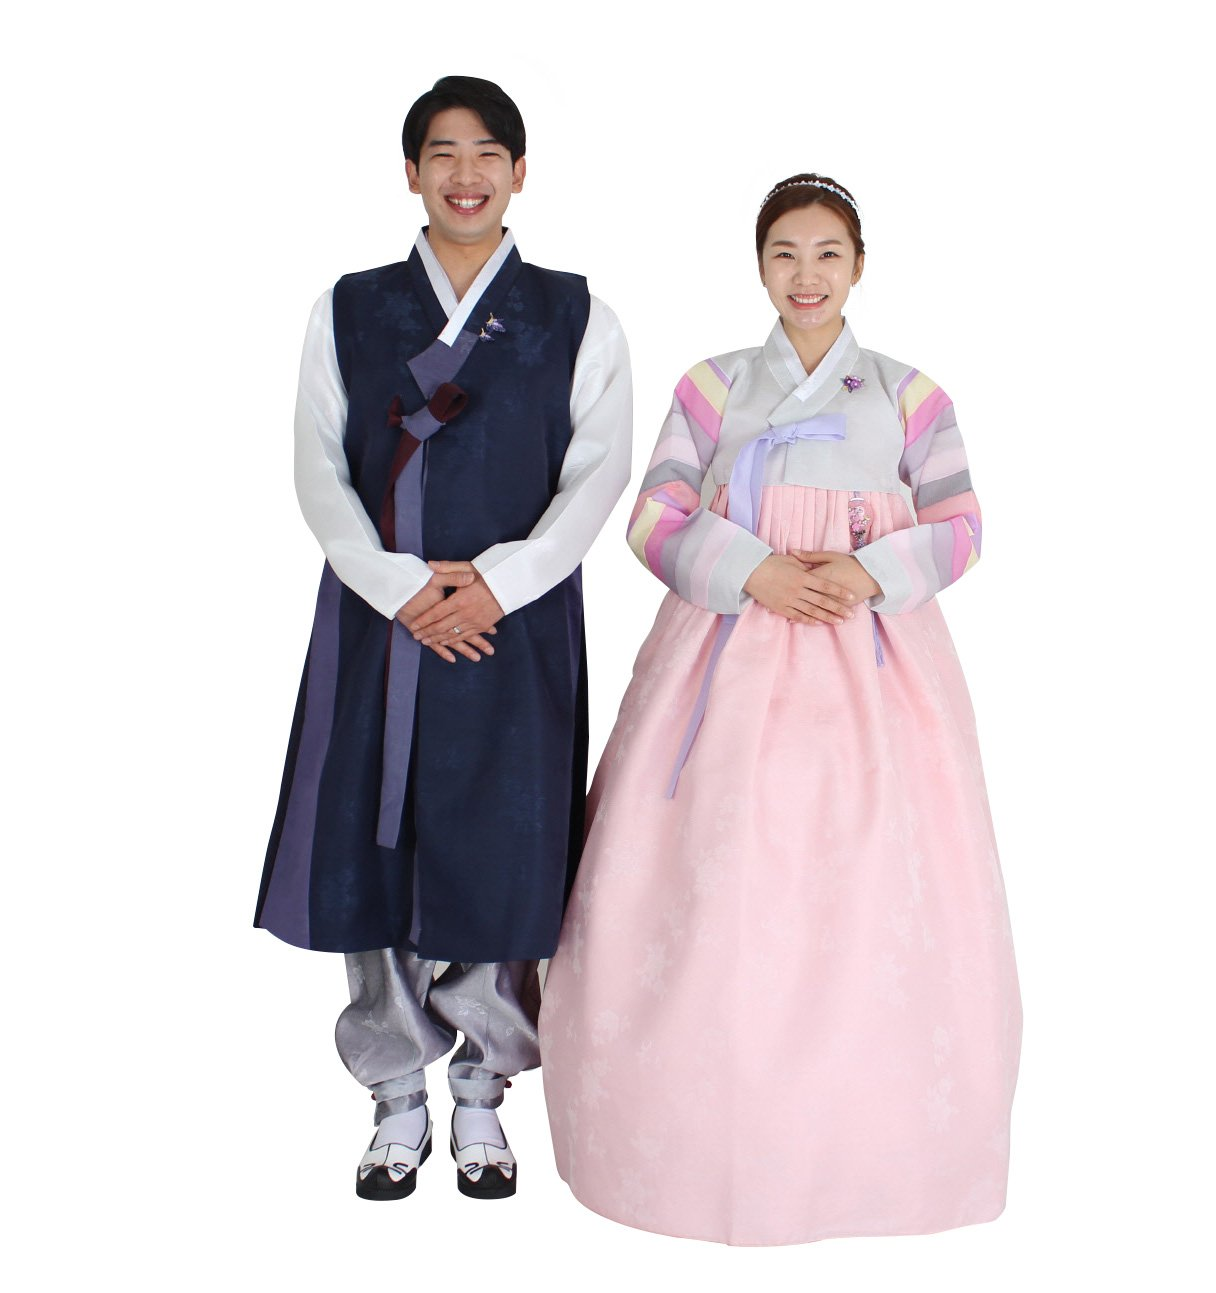 Hanbok Korea Traditional Costumes Womens Mens Couple Weddings Birthday Speical Ceremony co100 (pants length 117cm (waist 34 inches))